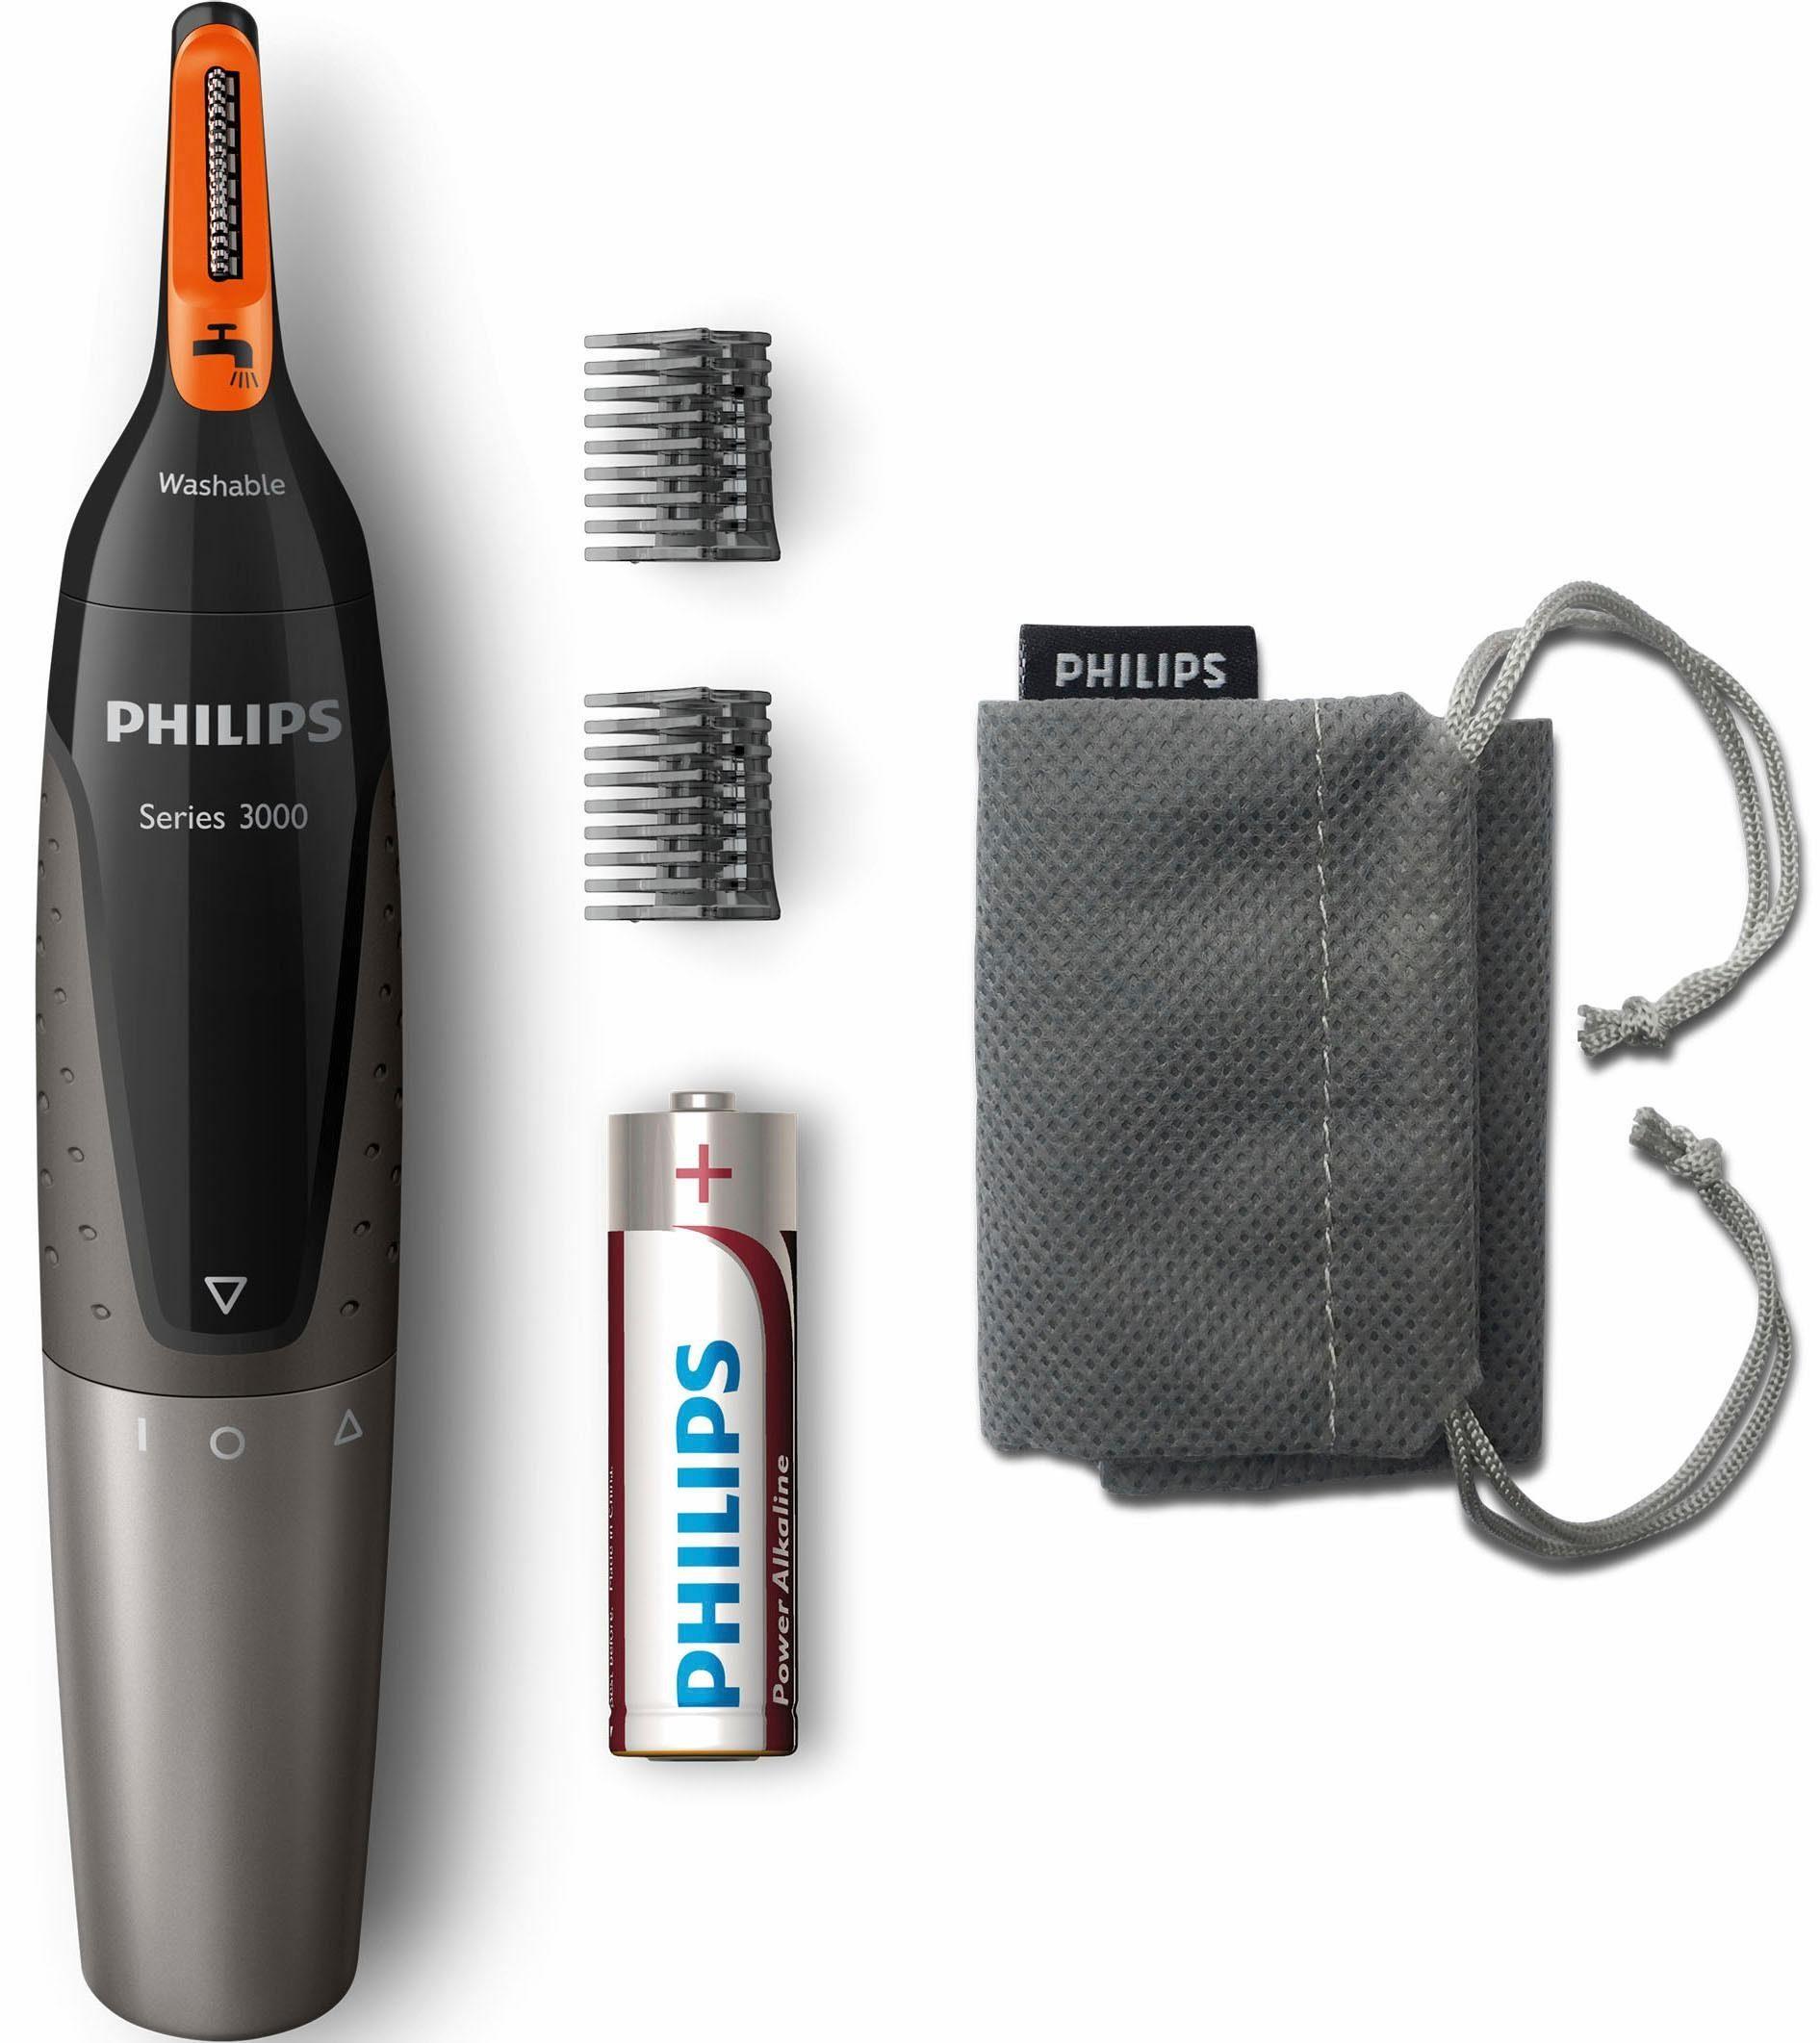 Philips Nasen- und Ohrhaartrimmer NT3160/10, ProtecTube-Technologie